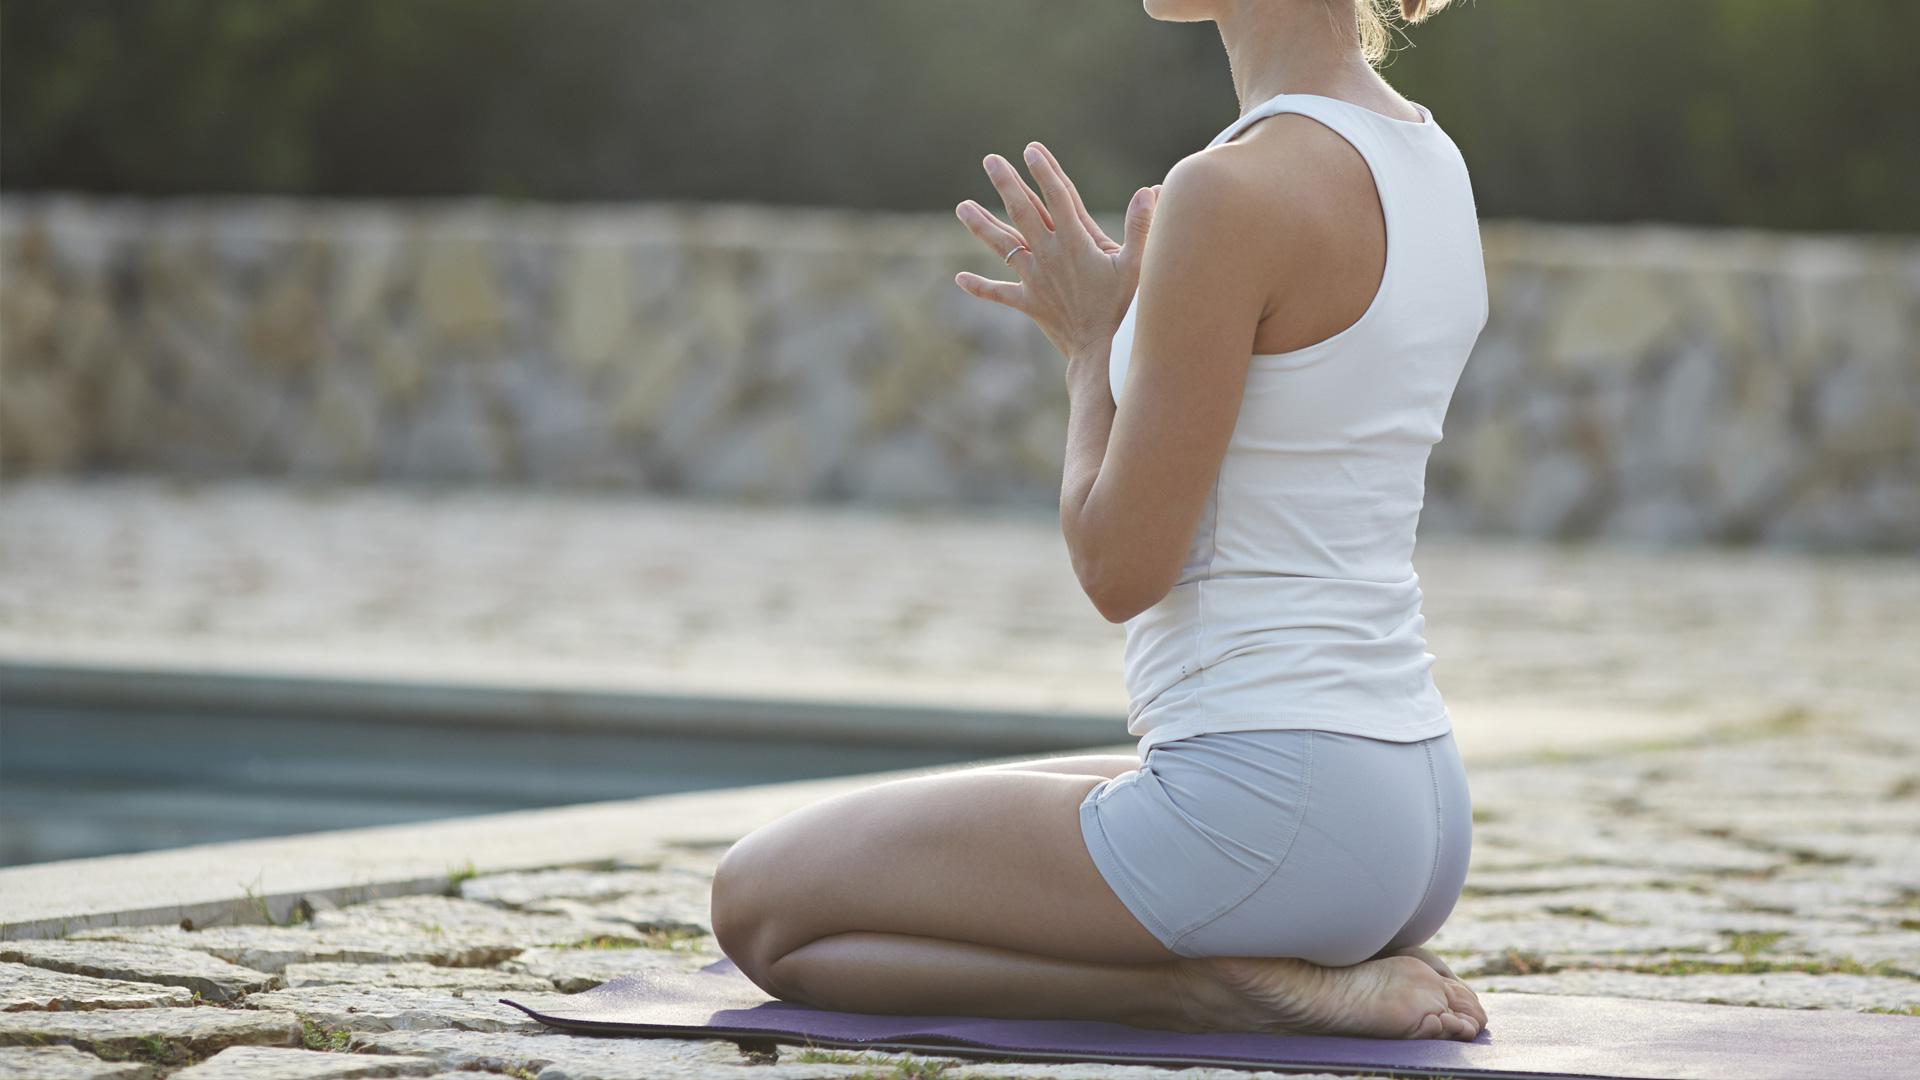 Wallpaper Yoga Meditation 1920x1080 Undek 1146262 Hd Wallpapers Wallhere